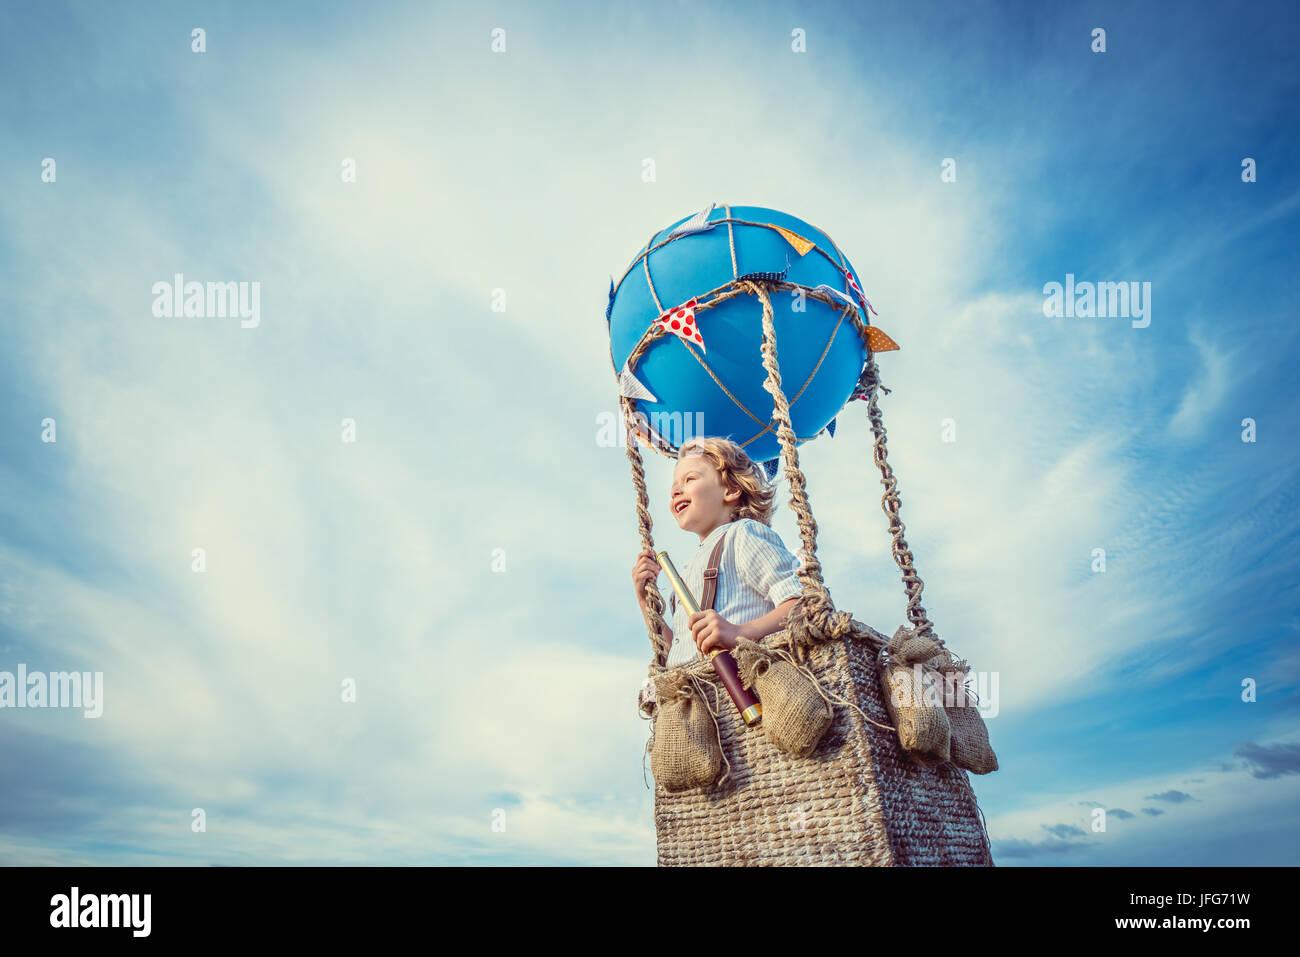 Vacations Photo Stock